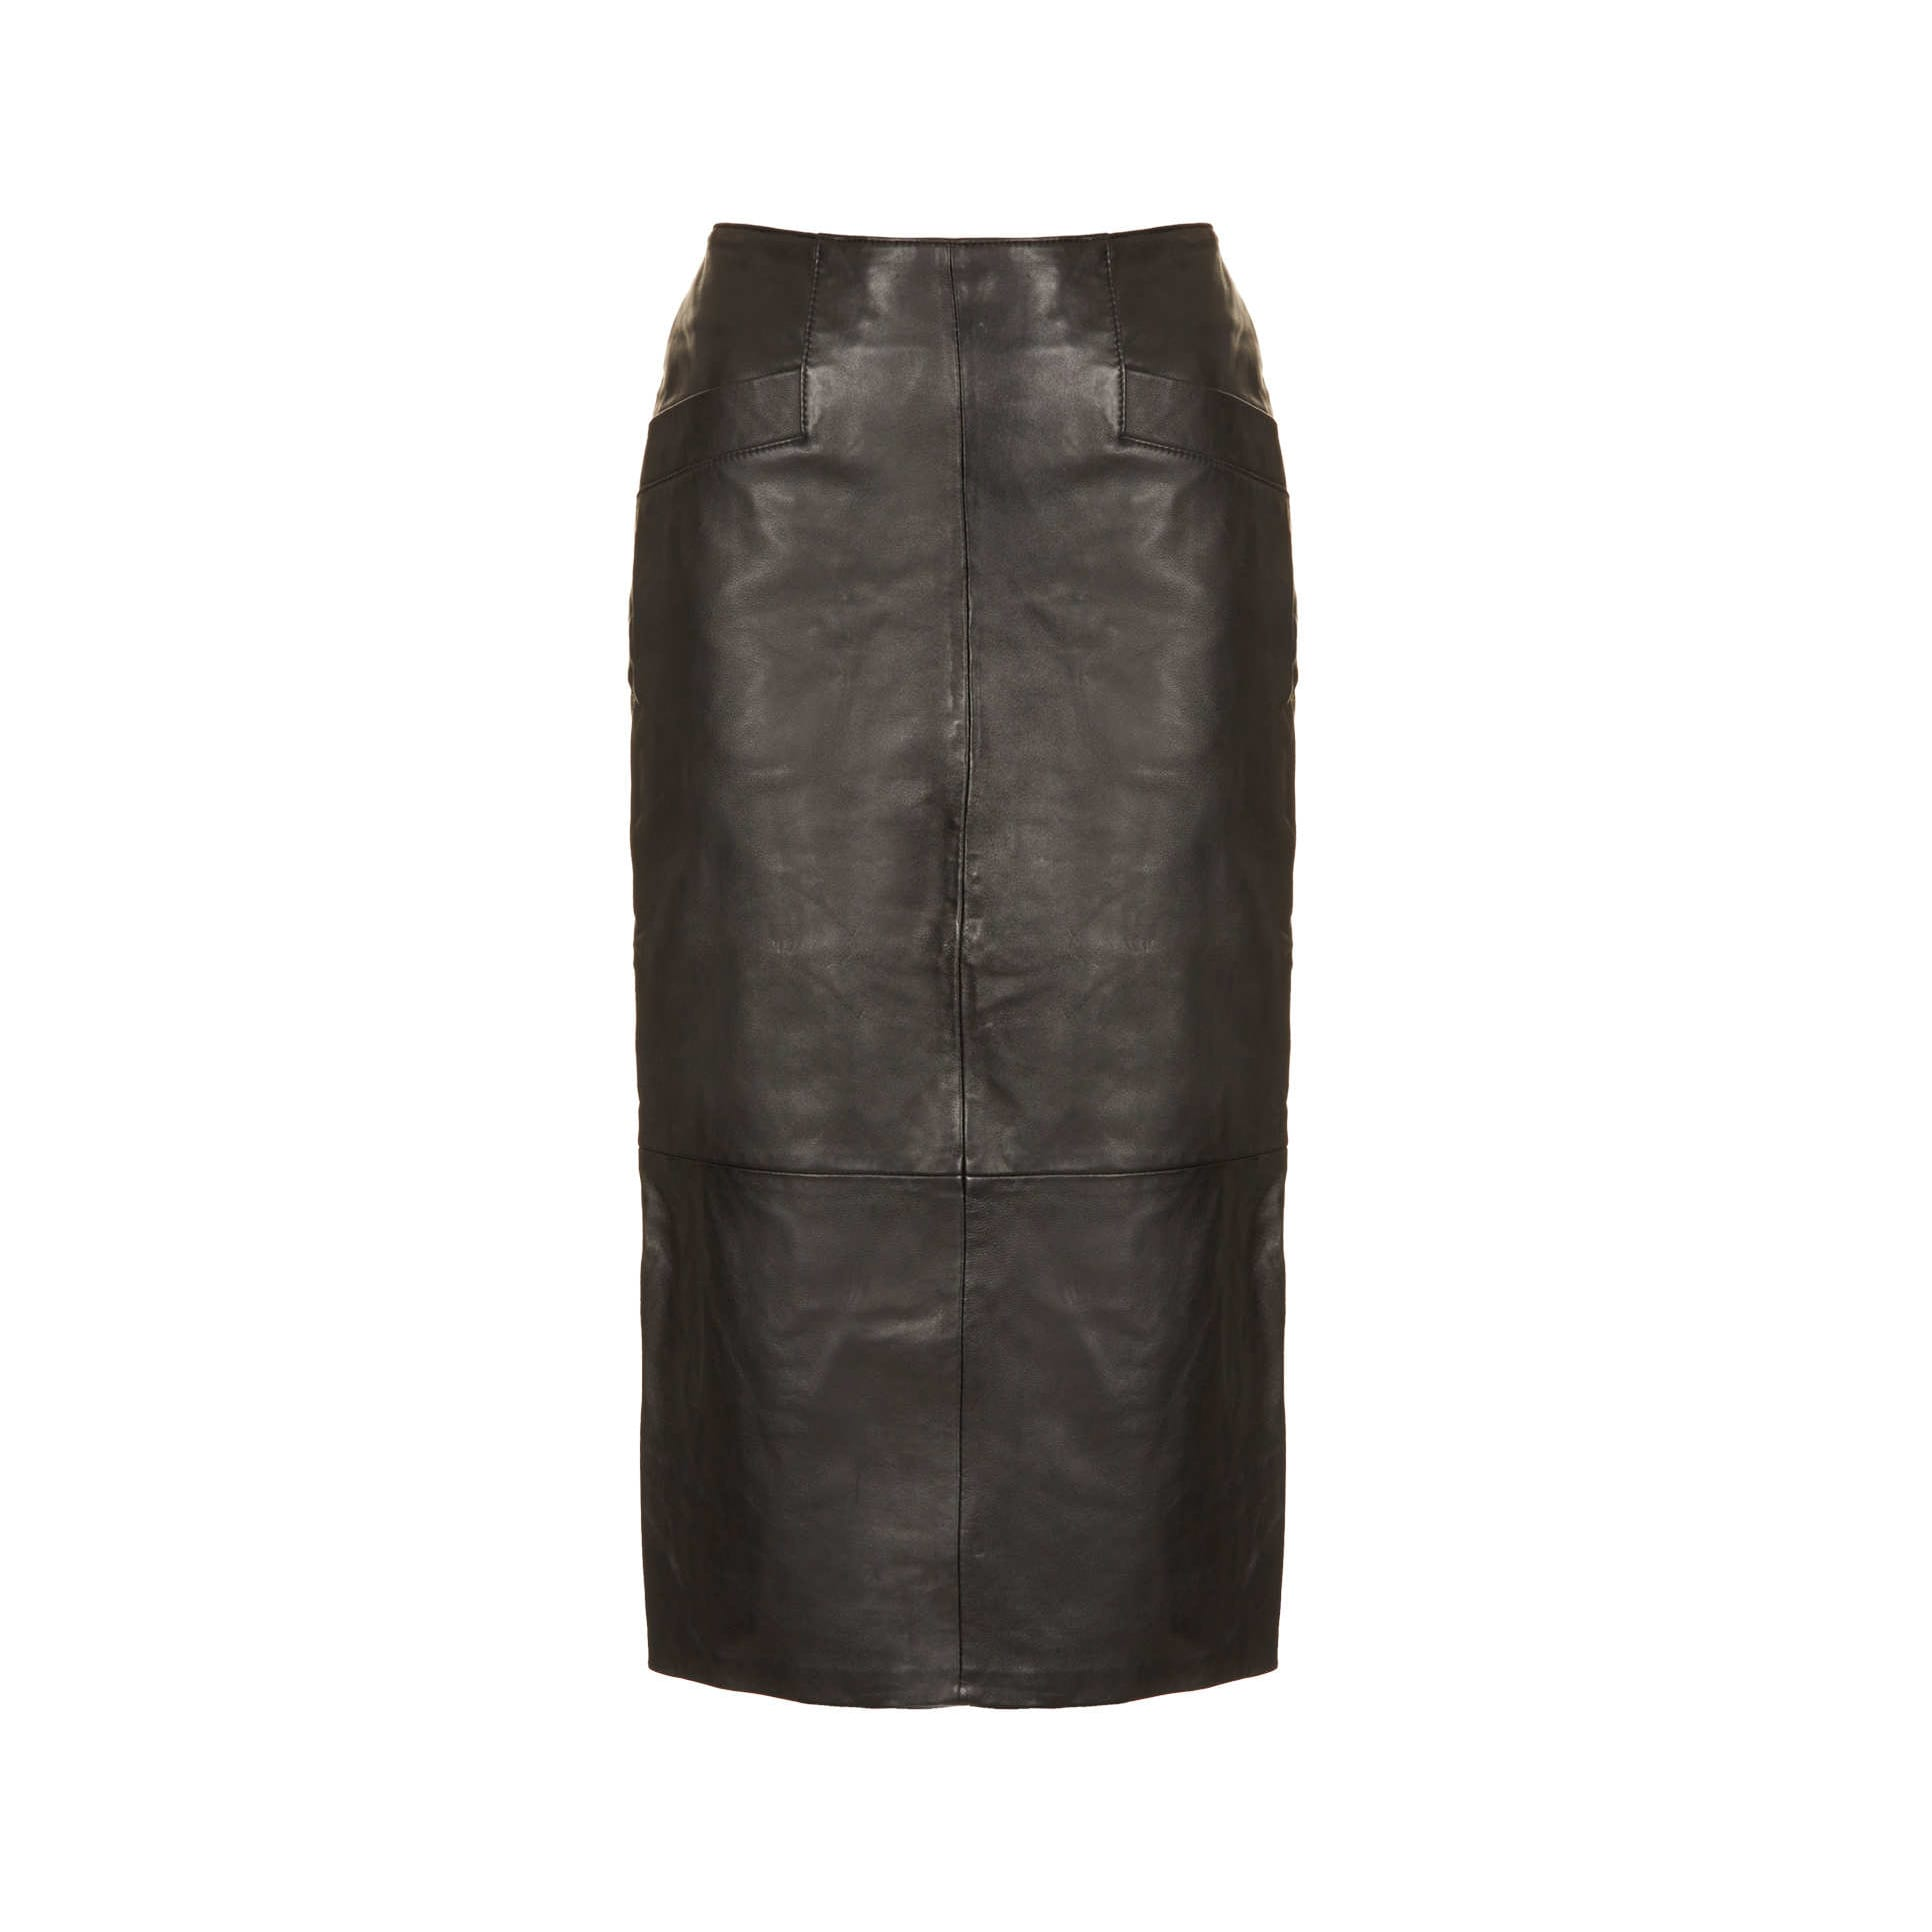 topshop black leather calf length pencil skirt style